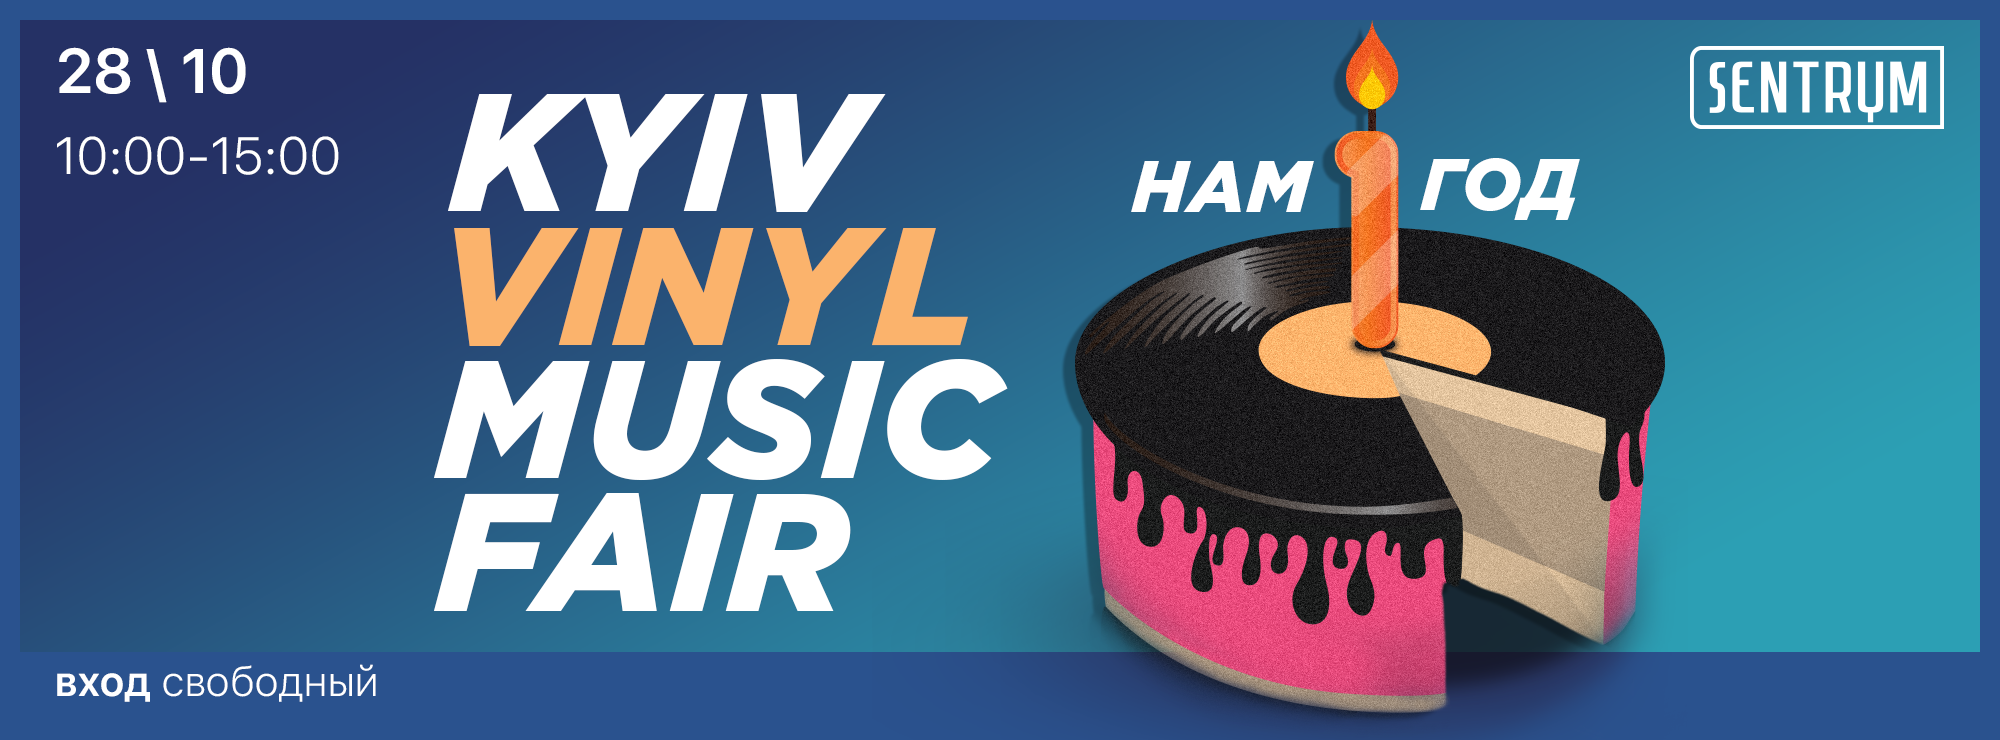 KYIV VINYL MUSIC FAIR. October 28